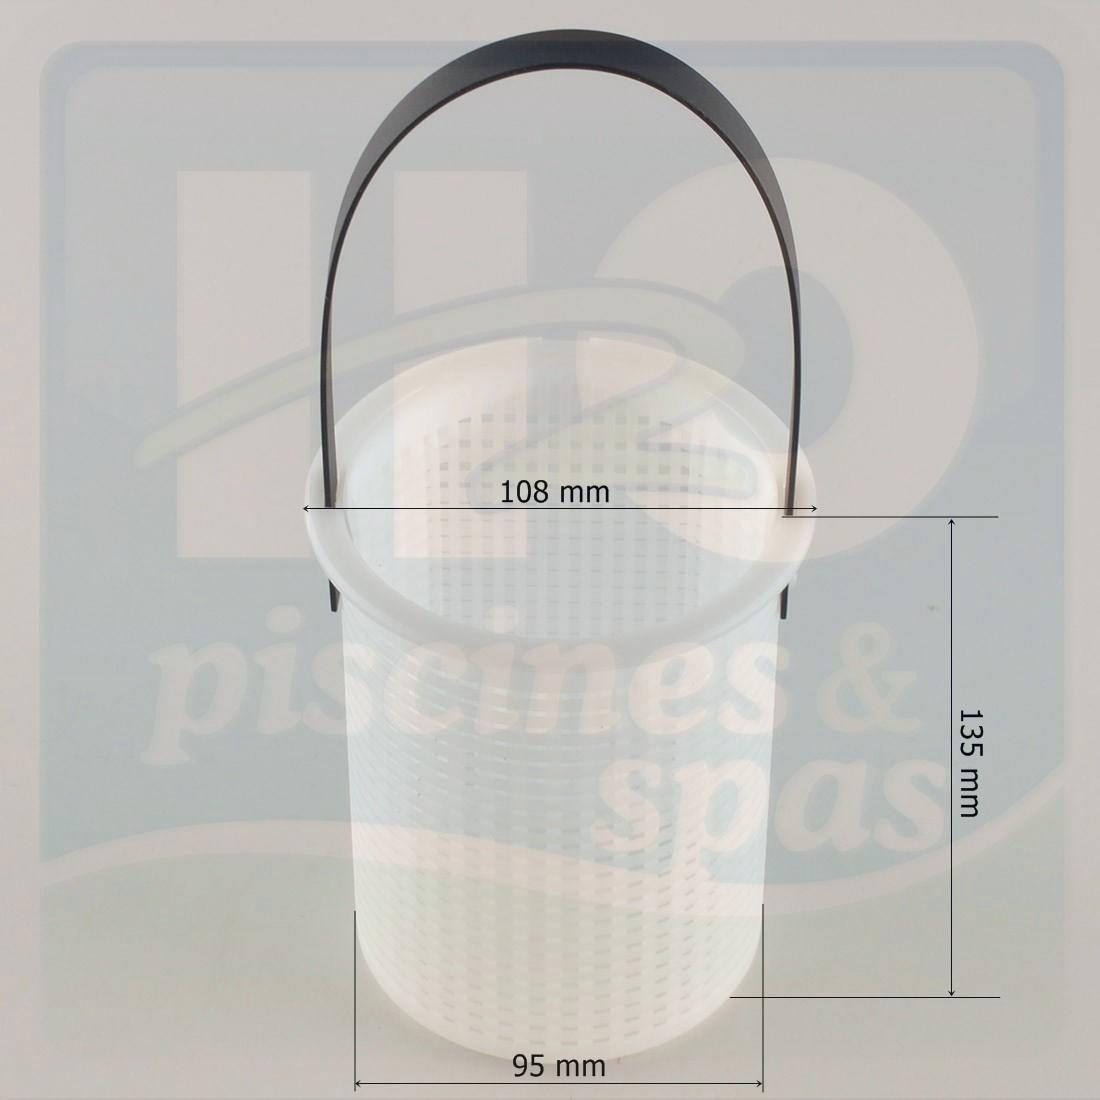 Panier de pr filtre de pompe astral sena h2o piscines for Panier piscine filtre